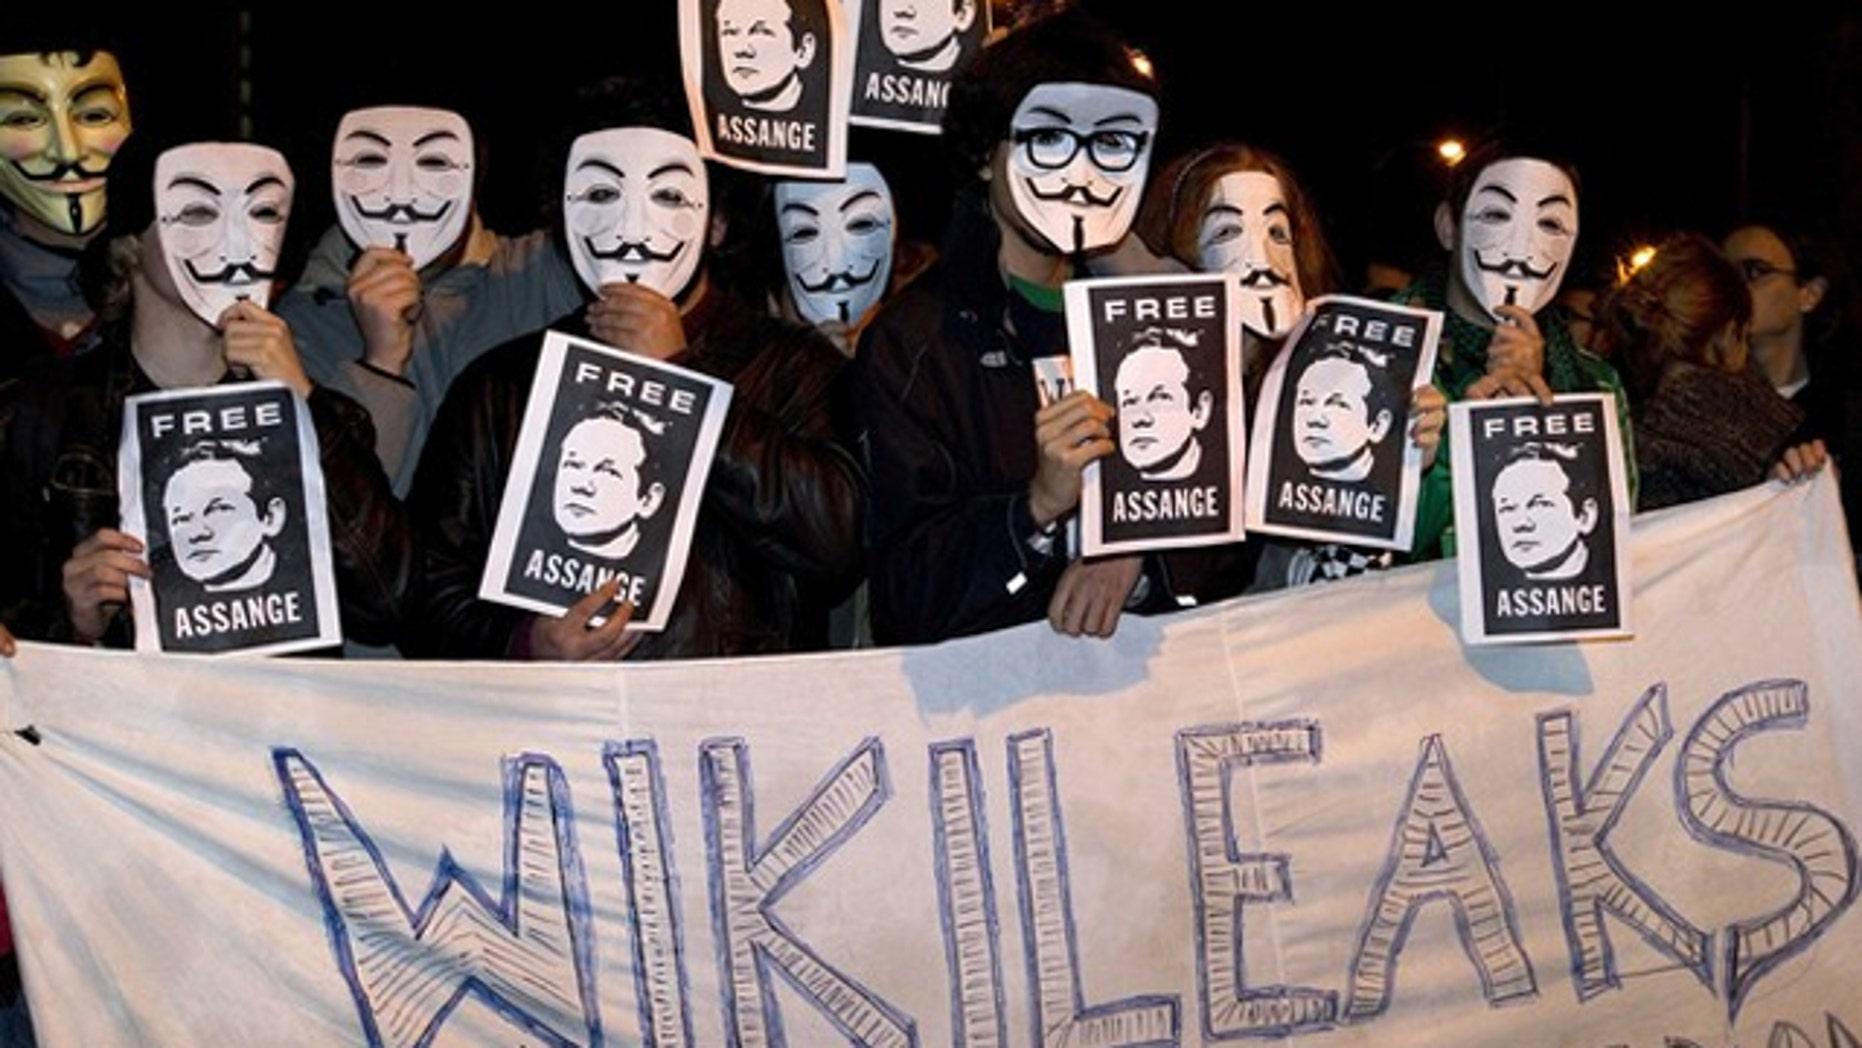 Hacker Group Declares 'Cyberwar' on US Government | Fox News